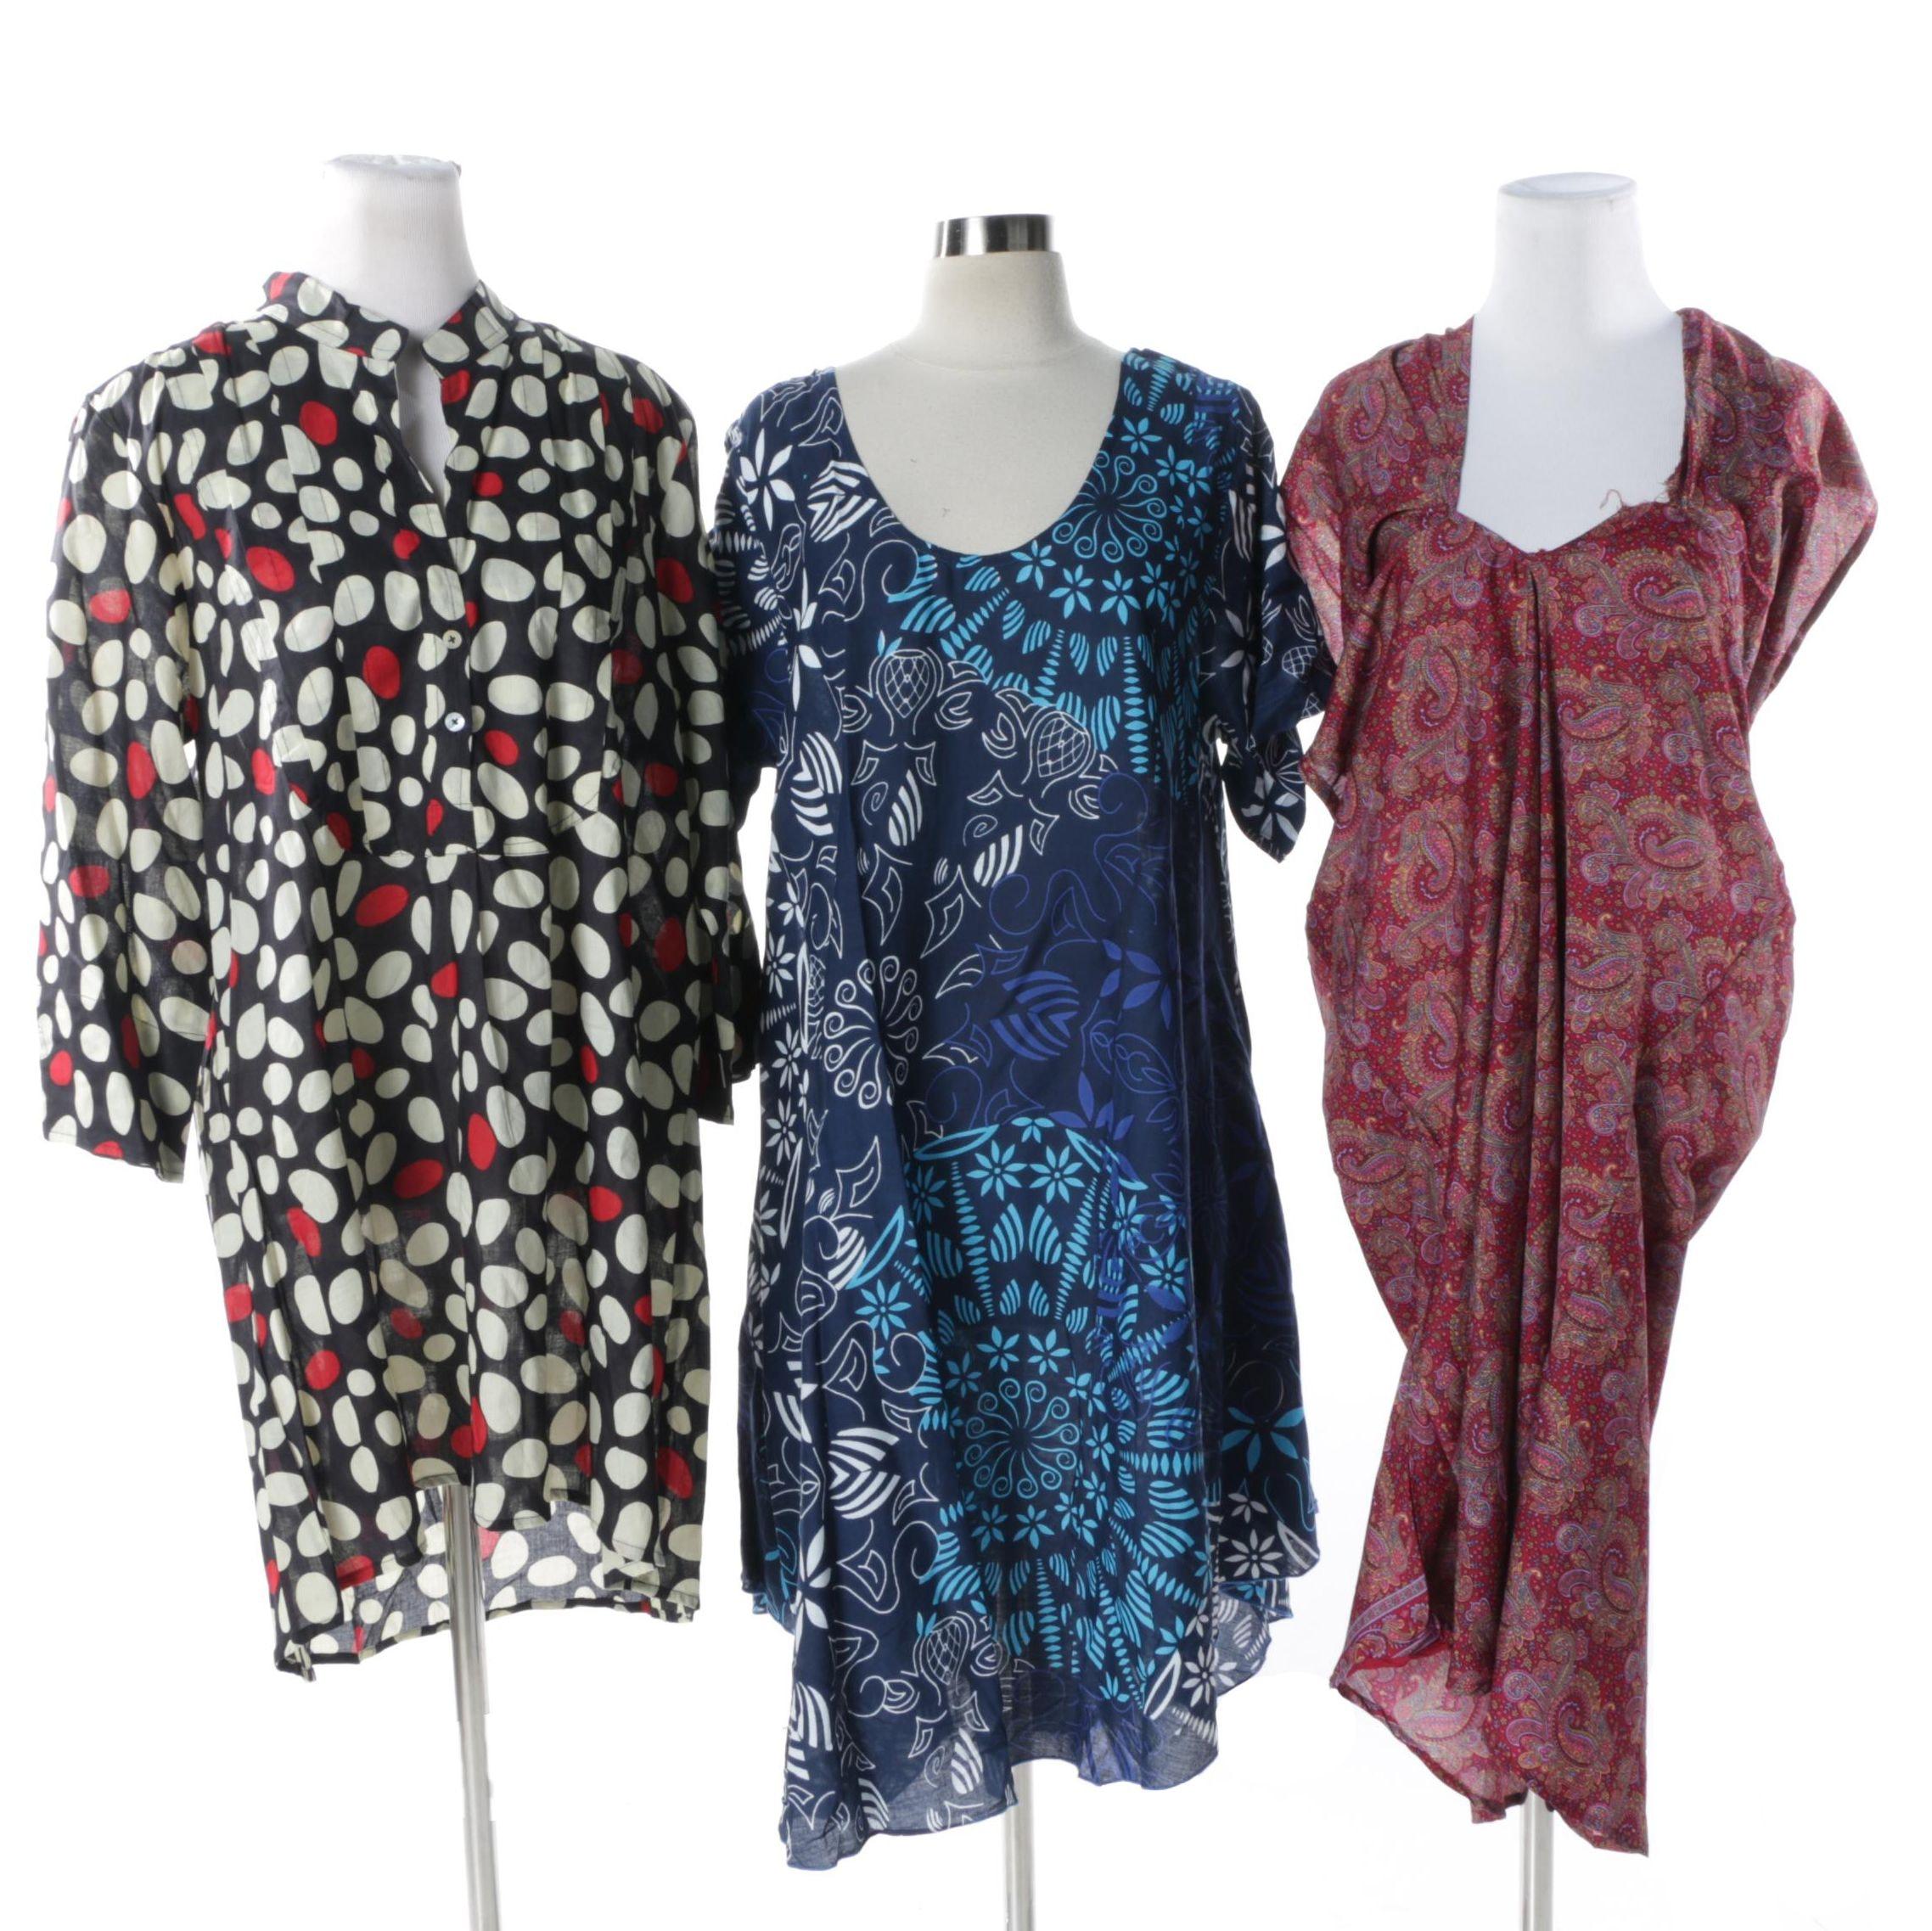 Aller Simplement 1X Dresses